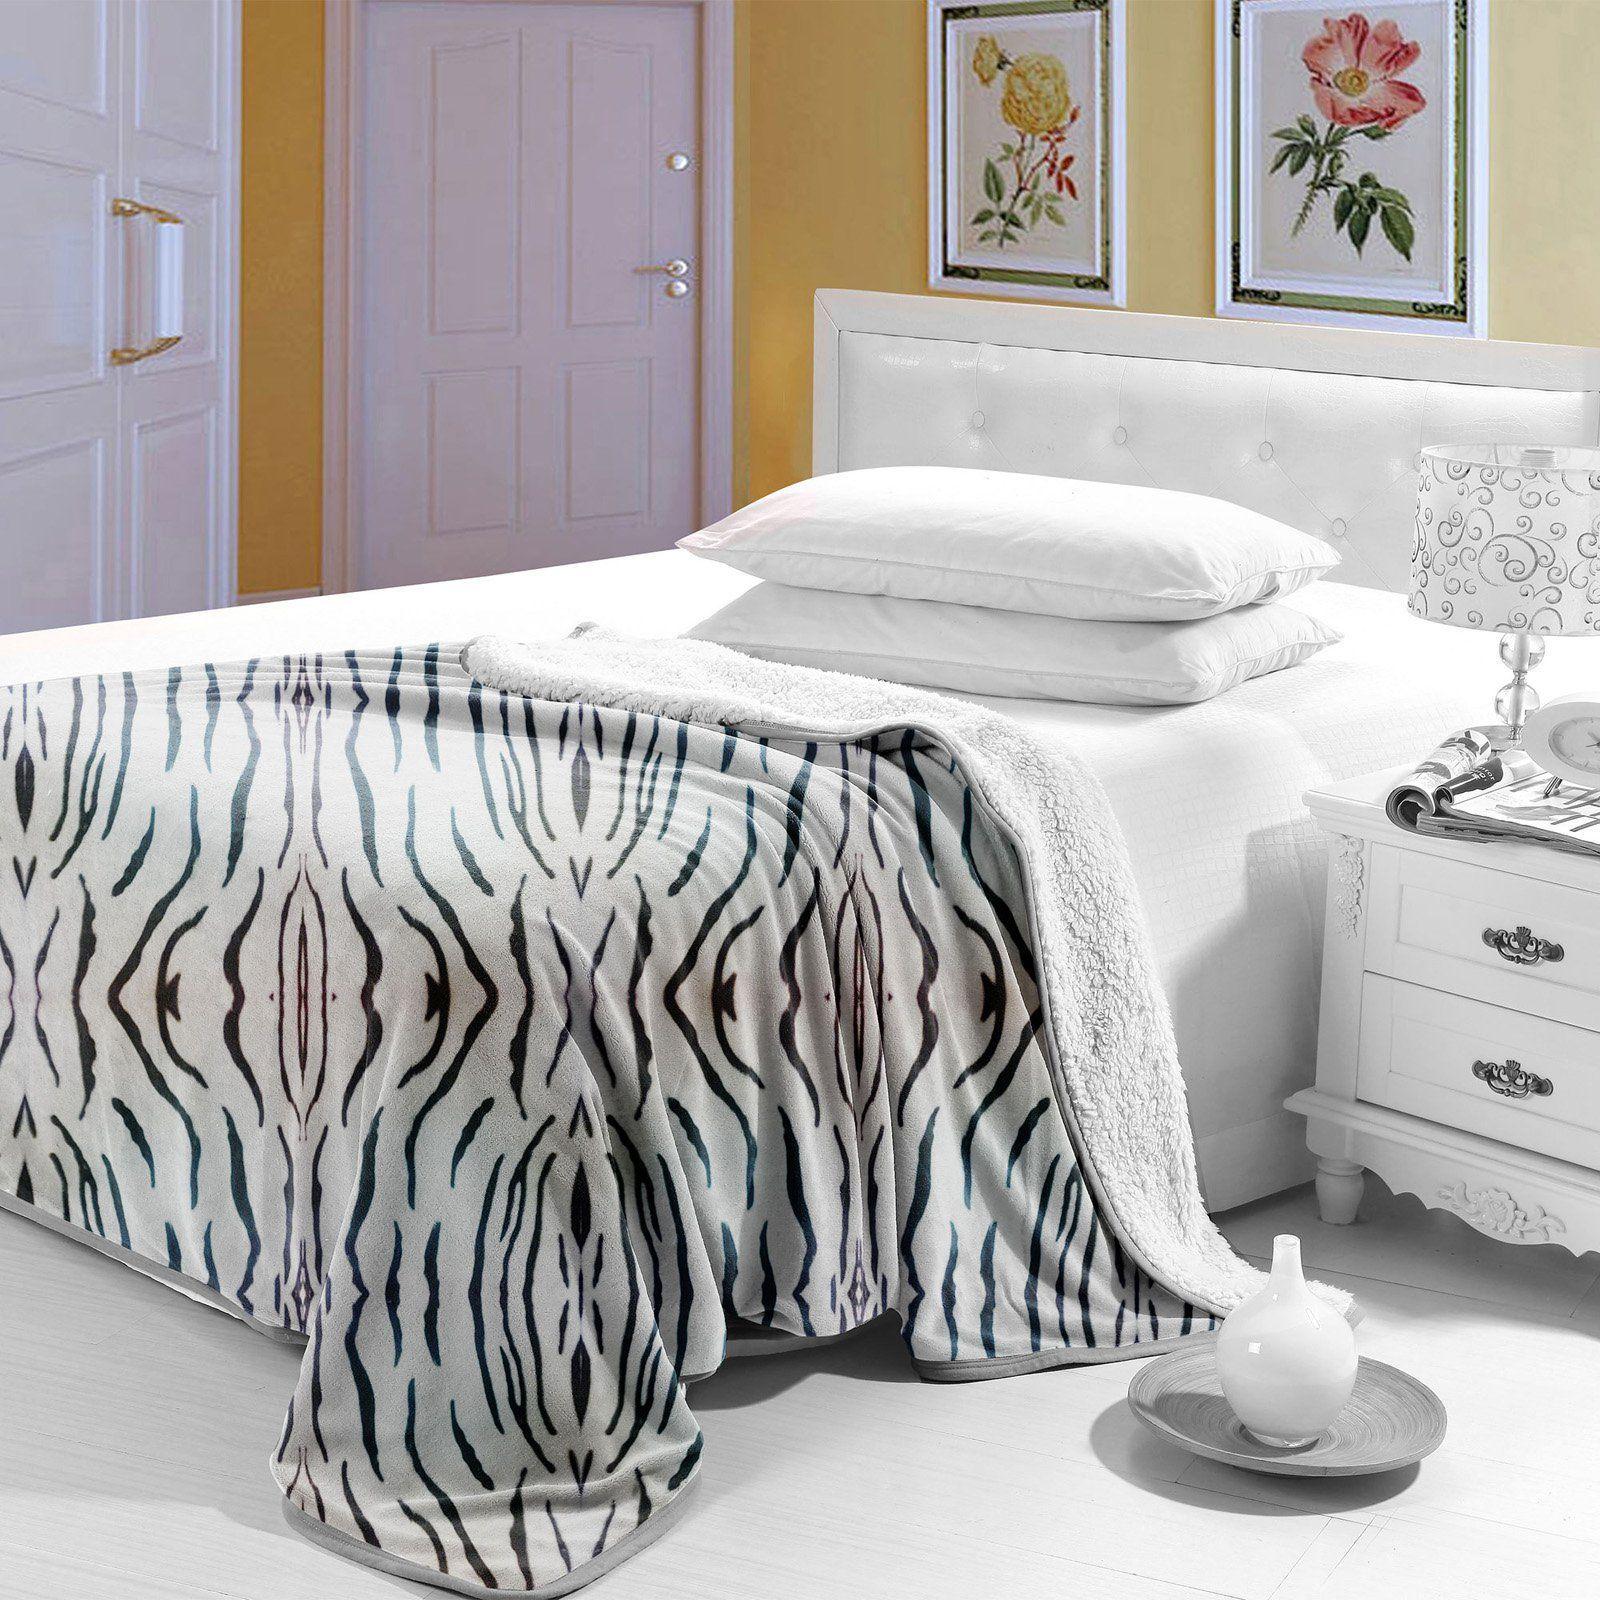 Lavish home animal print fleece blanket with sherpa backing